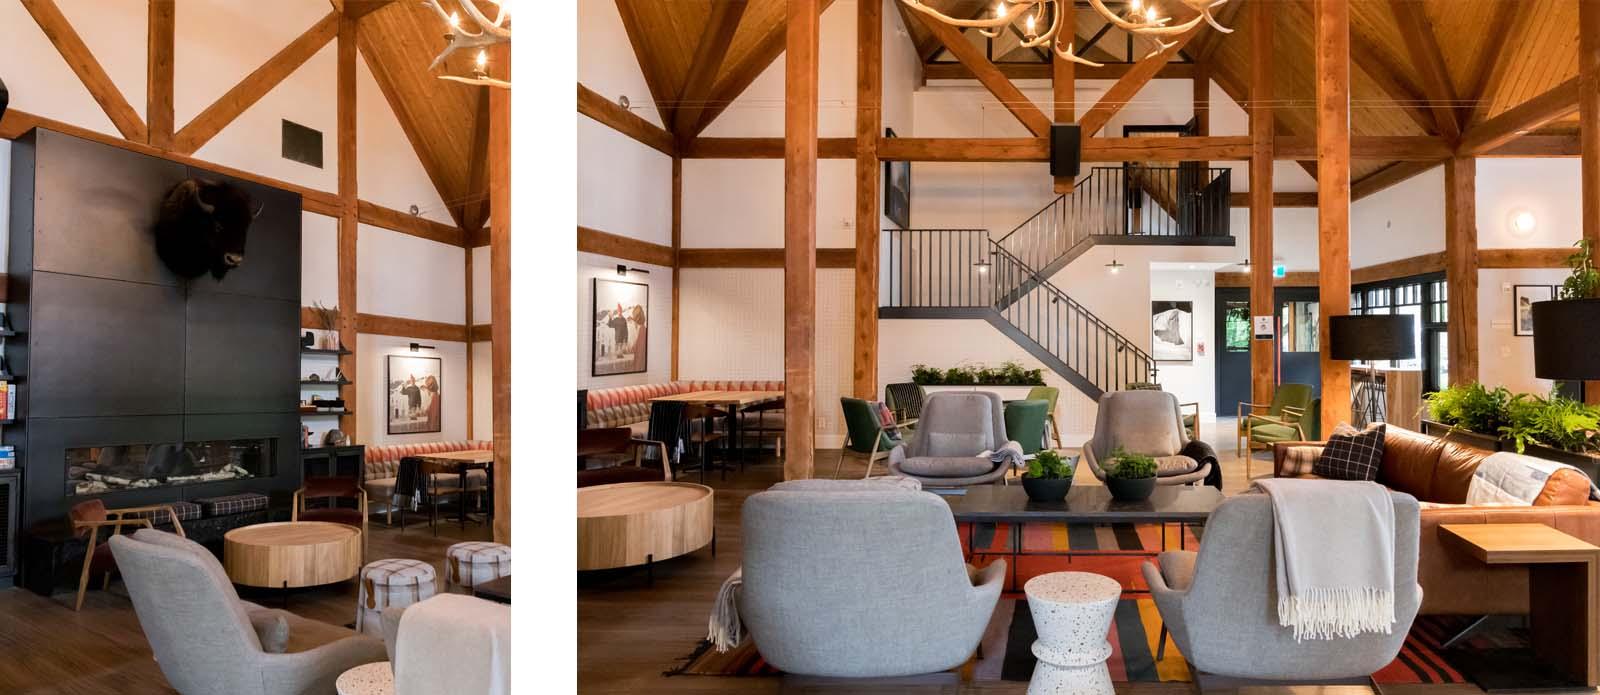 Buffalo Mountain Lodge | Banff Interior Design | Restaurant Interior Design